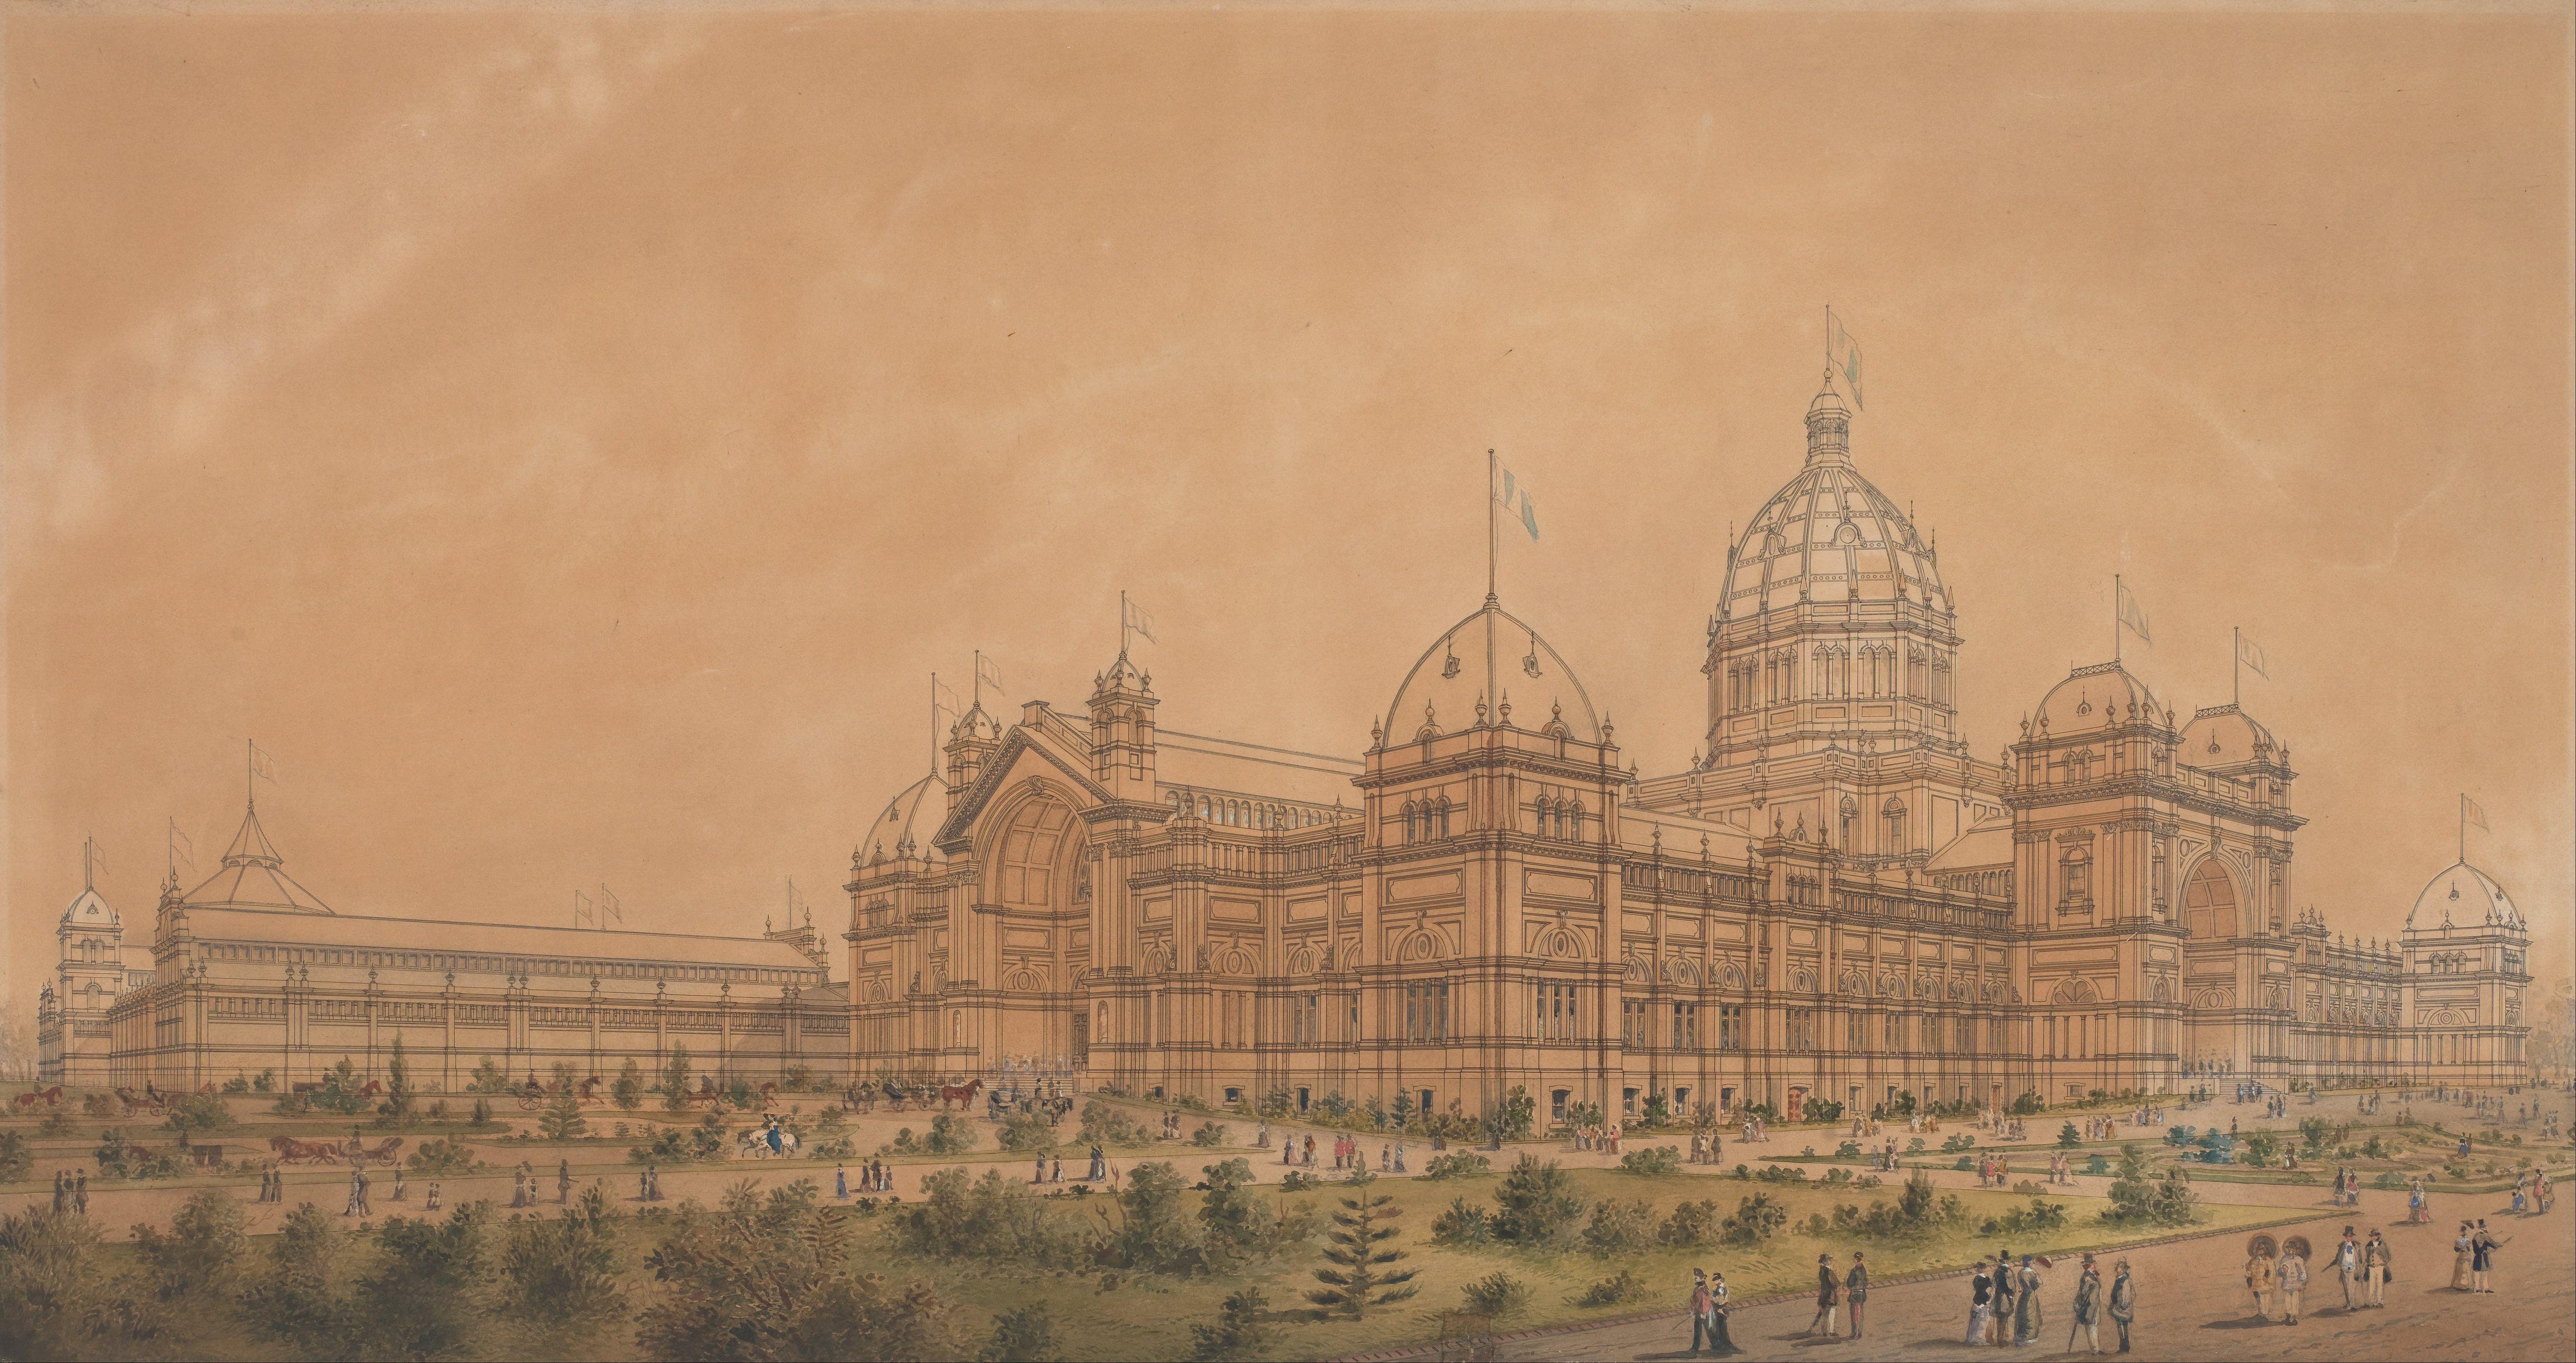 Melbourne International Exhibition (1880) | The VICTORIAN Era ...